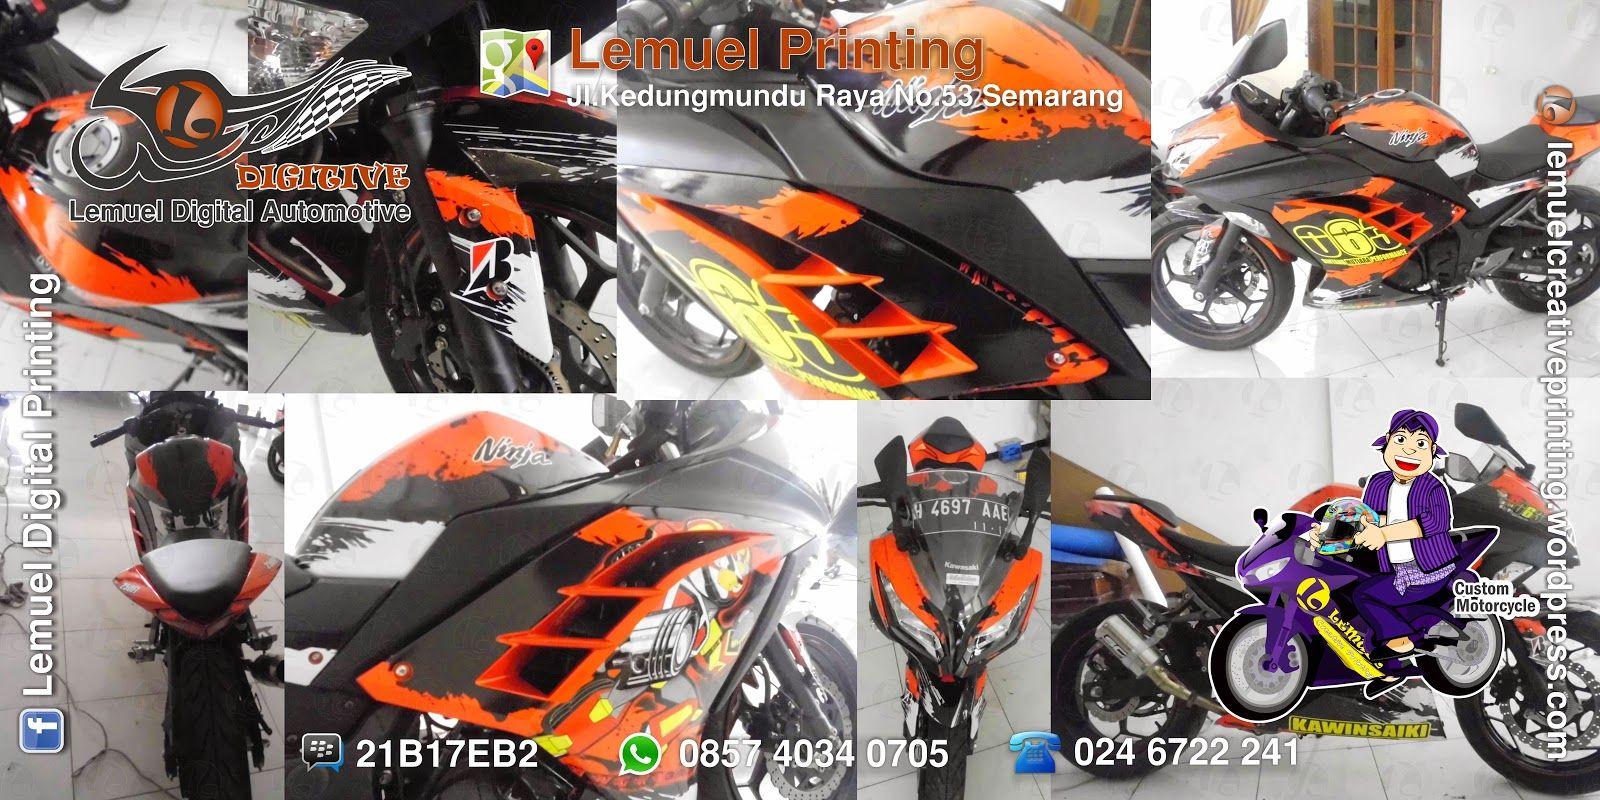 Lemuel Produksi Decal Vinyl Striping Motor Fullbody Kawasaki Ninja